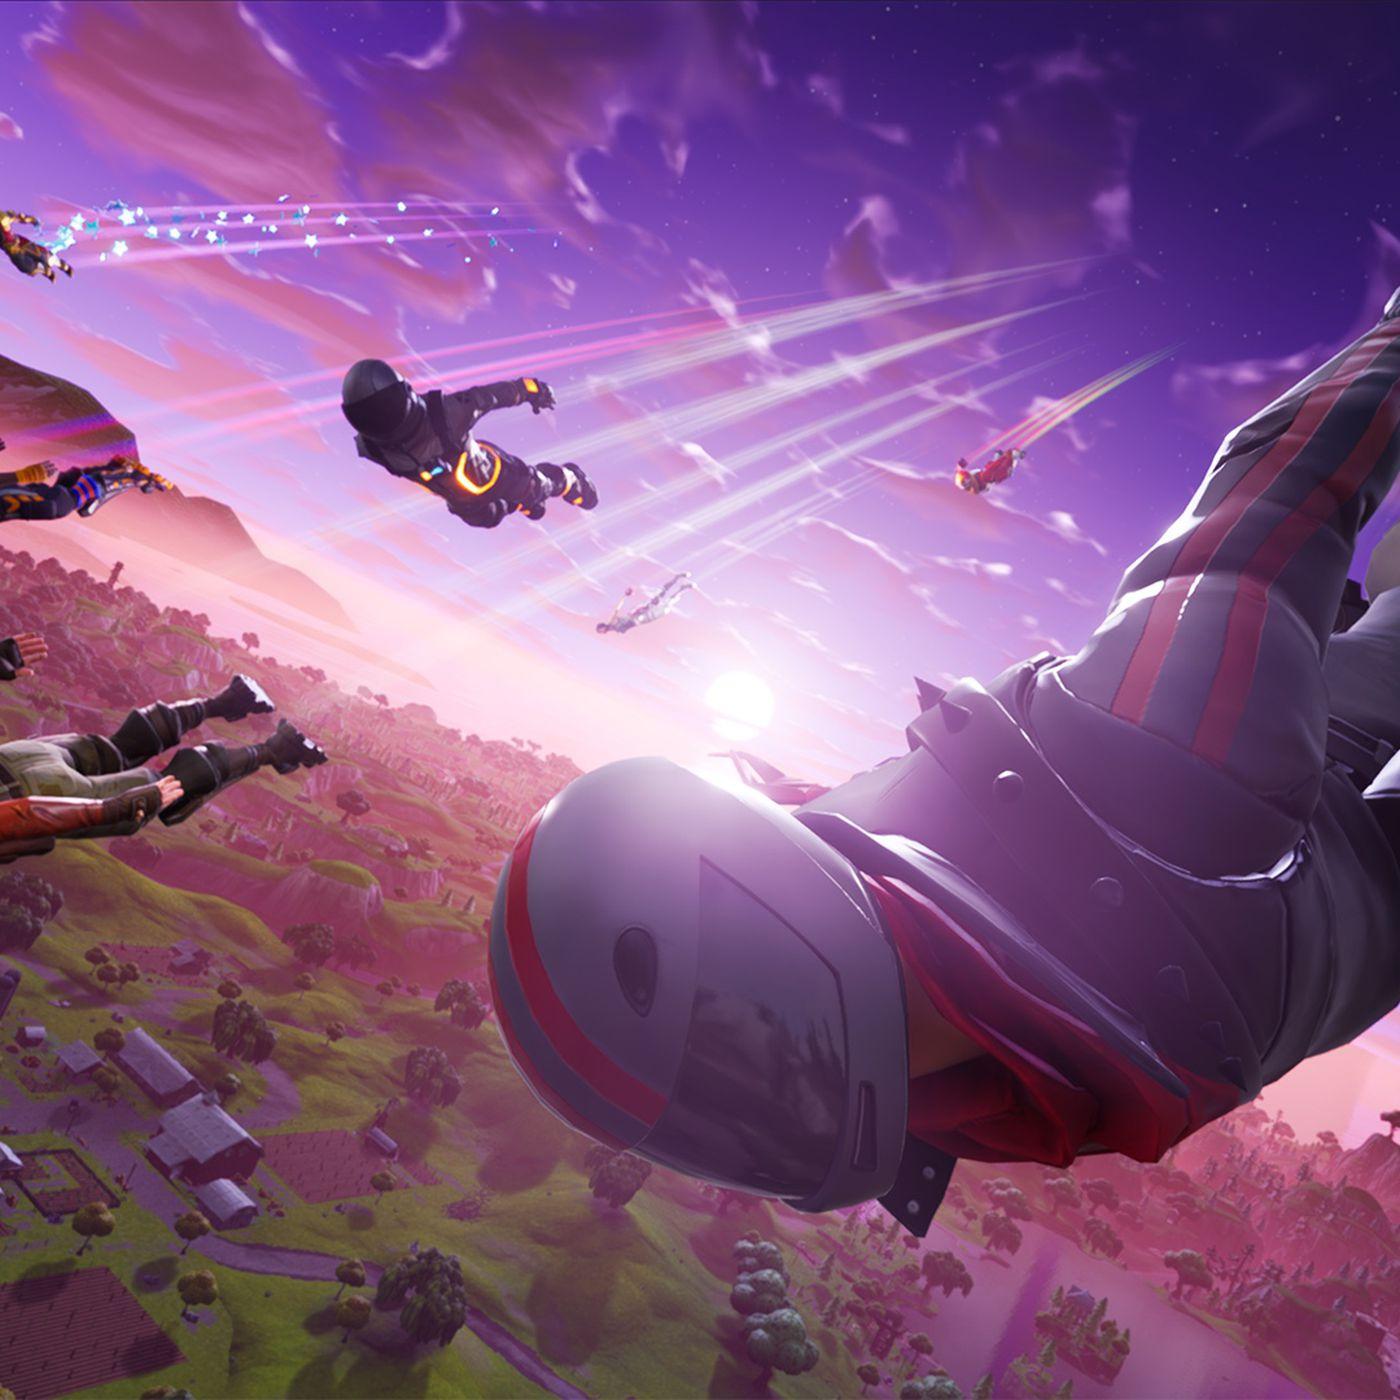 Fortnite Help Epic Games pubg maker drops suit against epic games over fortnite - polygon